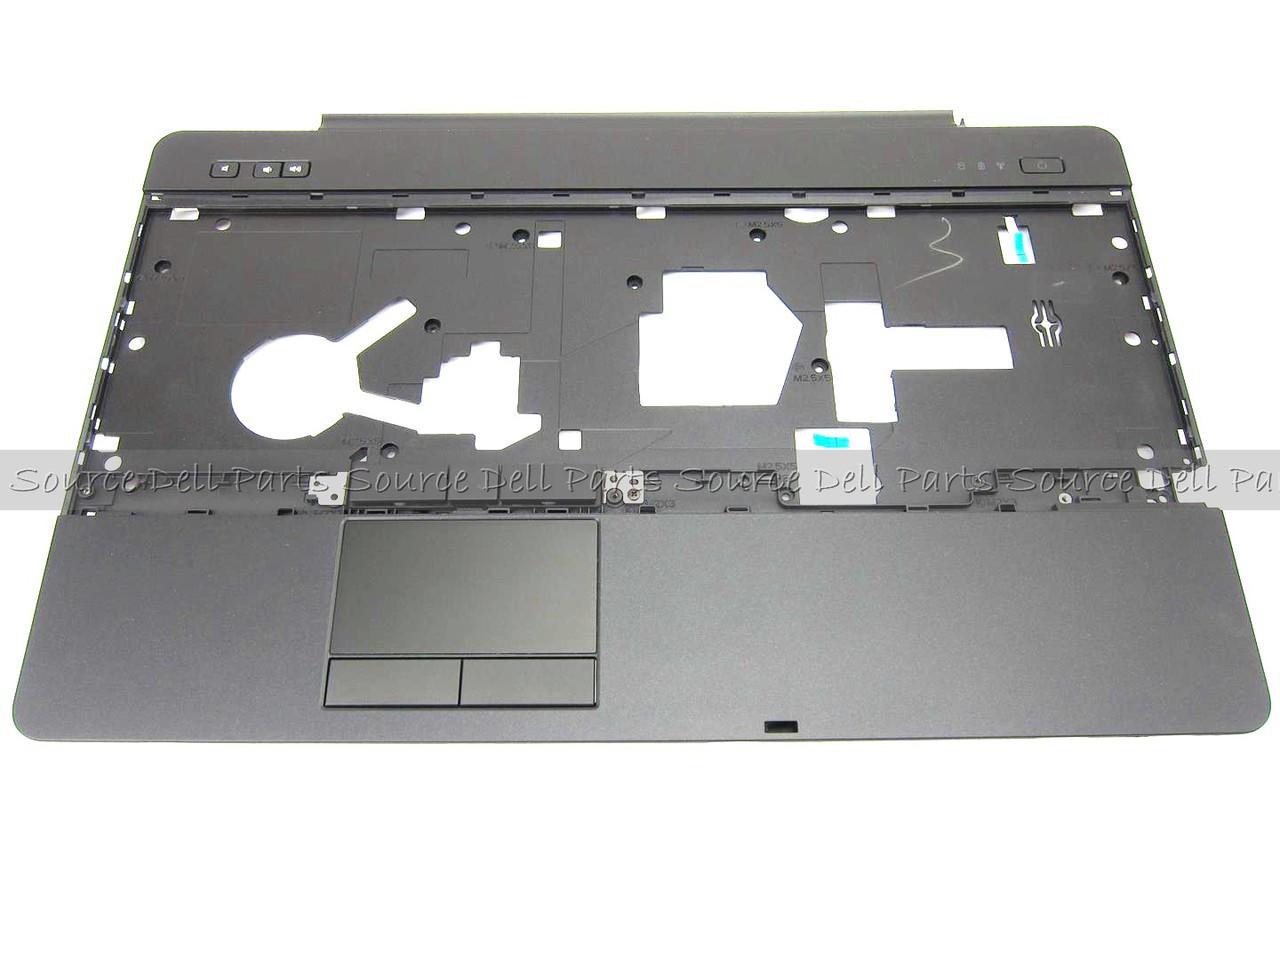 Dell Latitude E6540 Palmrest Touchpad Assembly - DJNC0